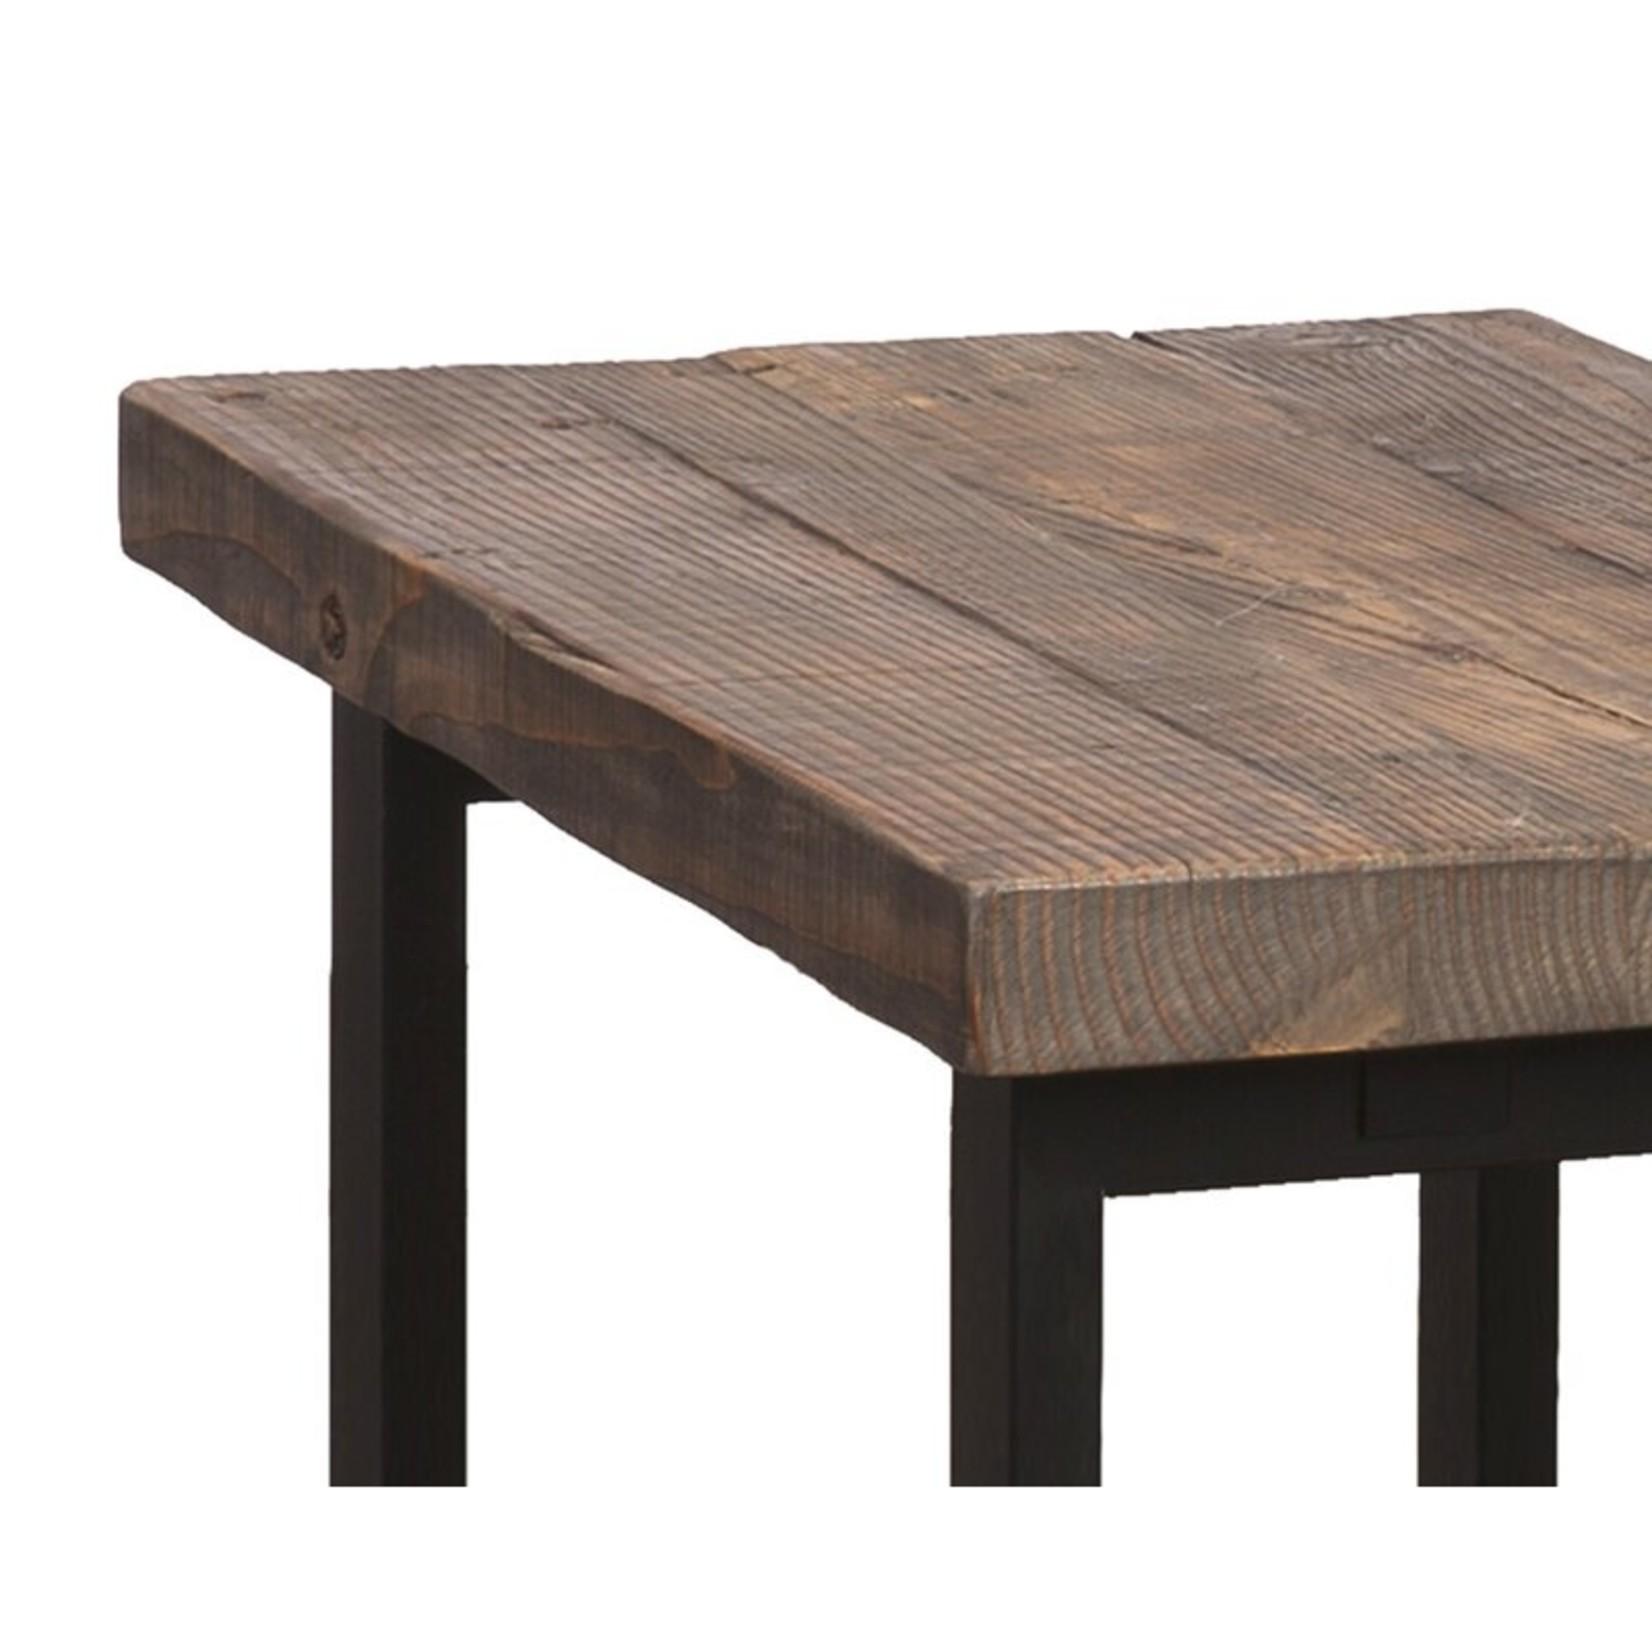 *Adams Solid Wood End Table